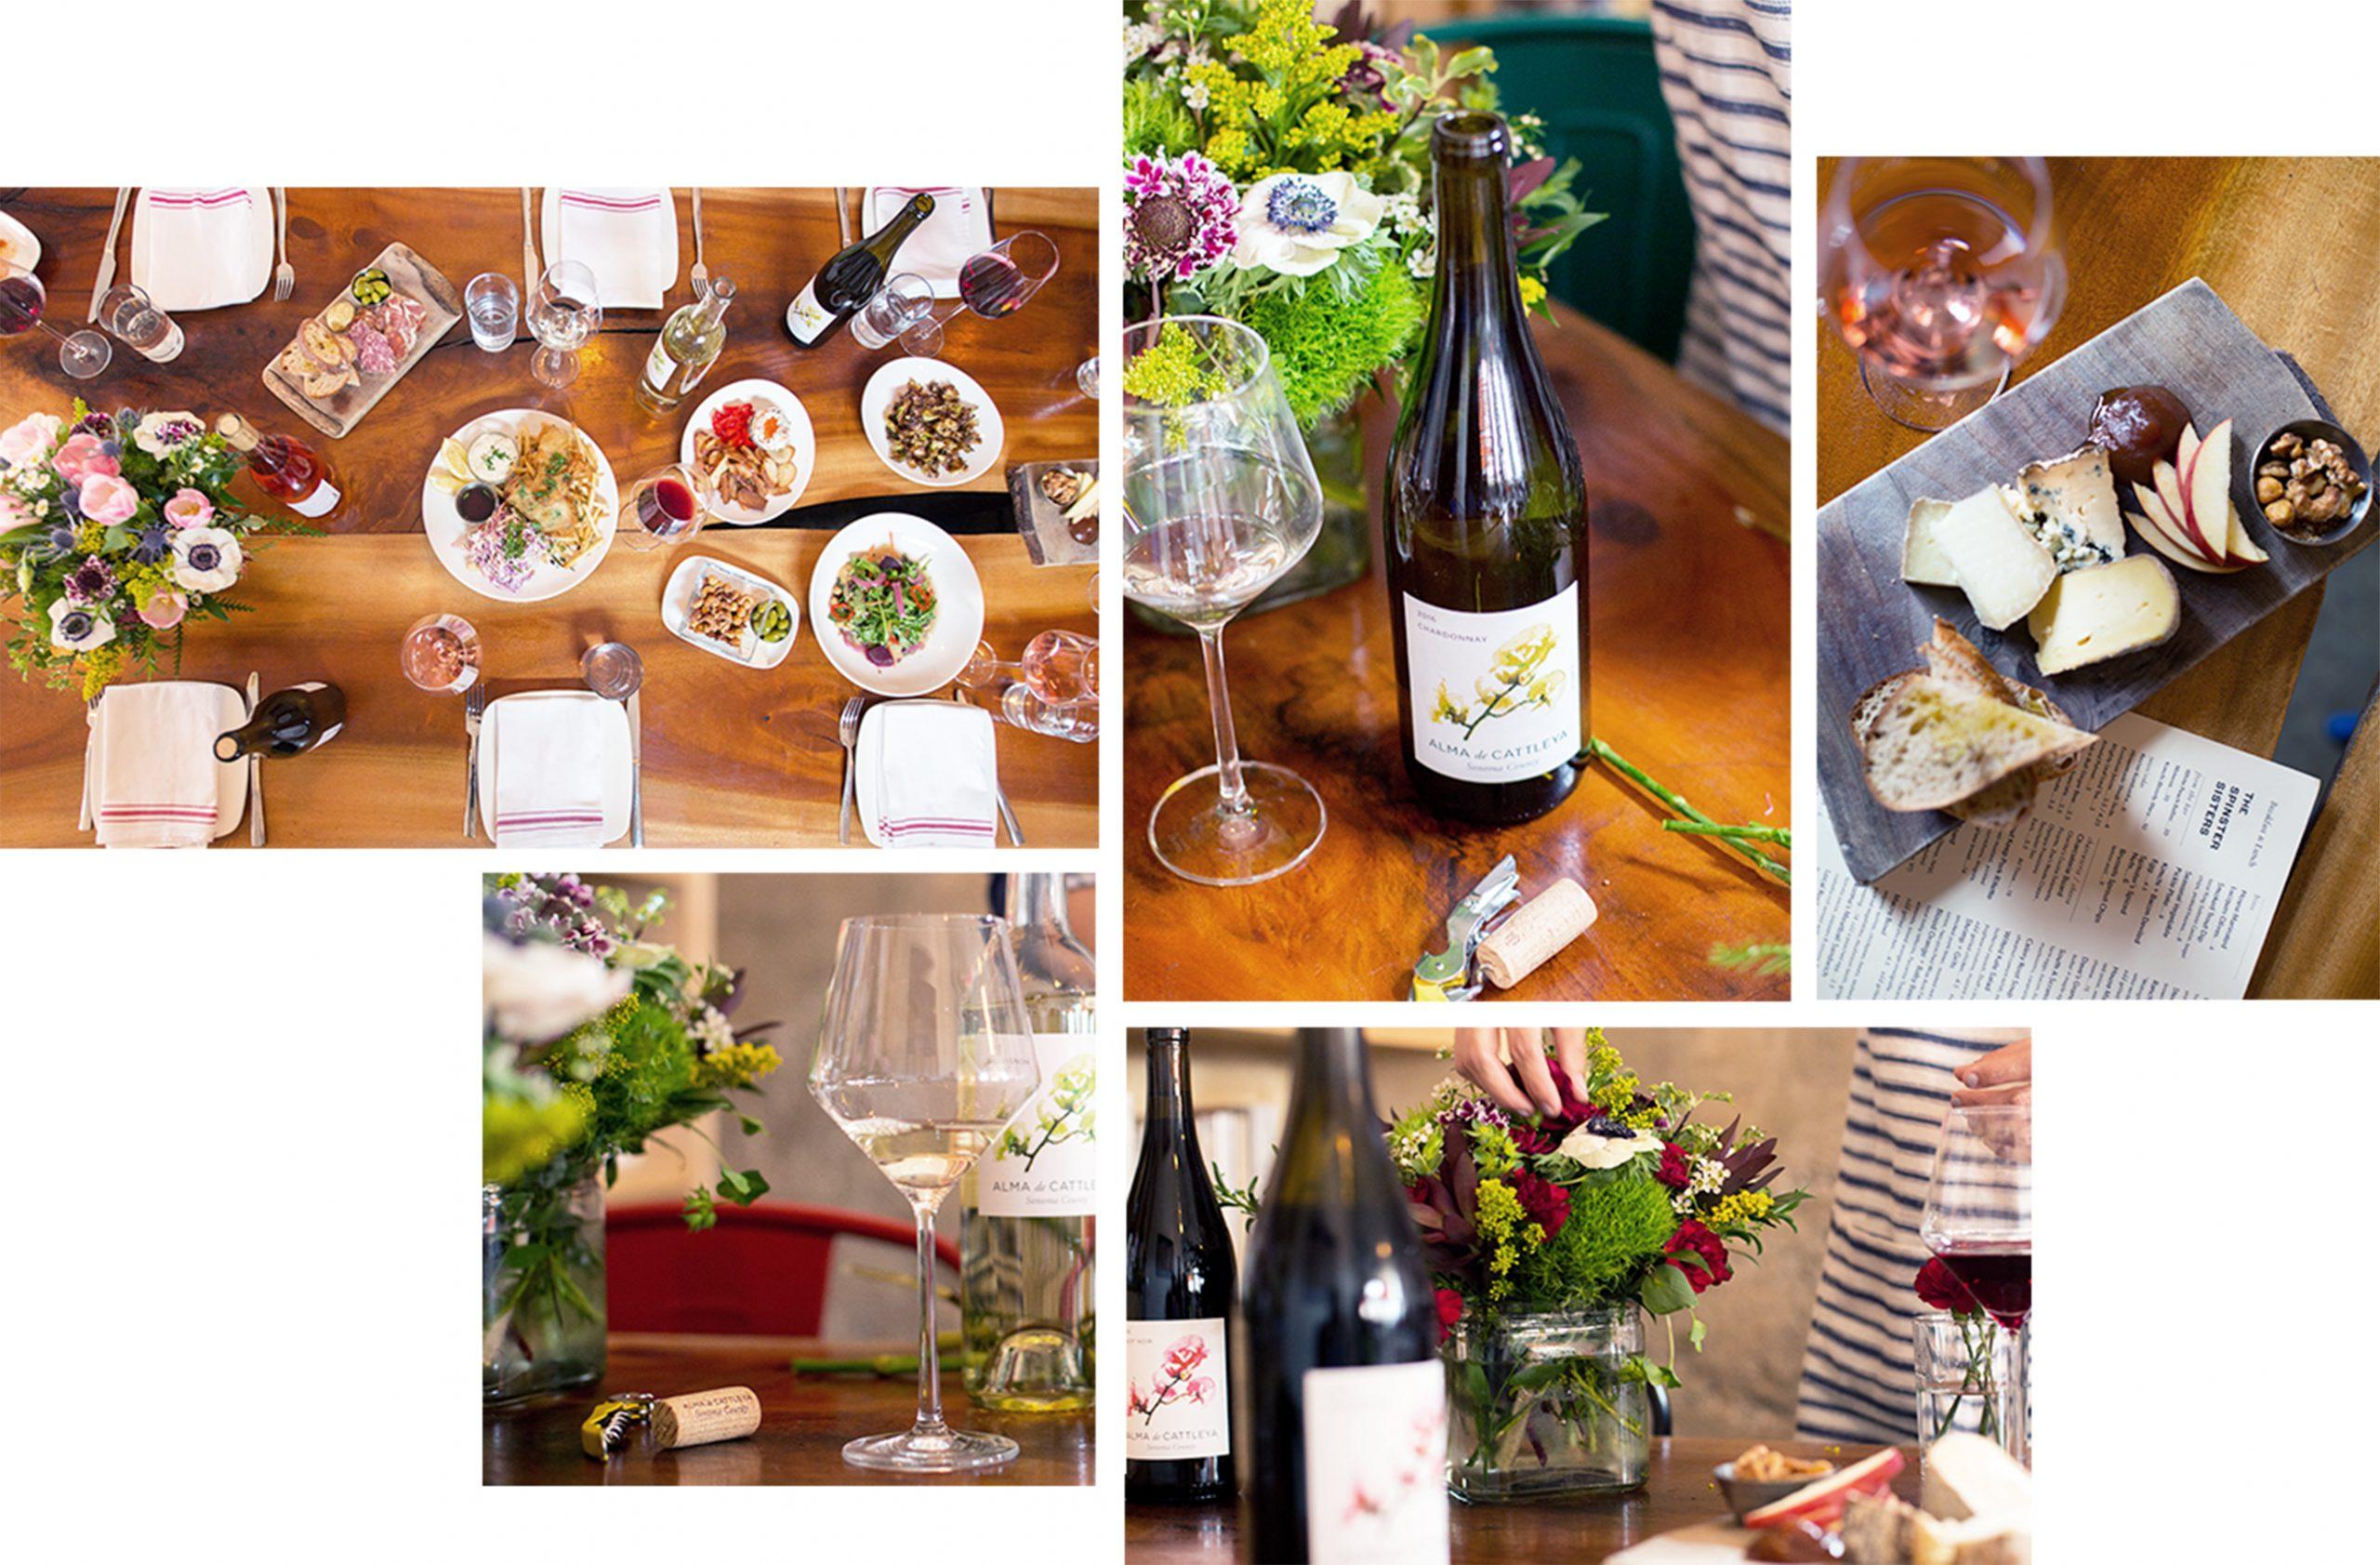 alma de cattleya wines food farm collage